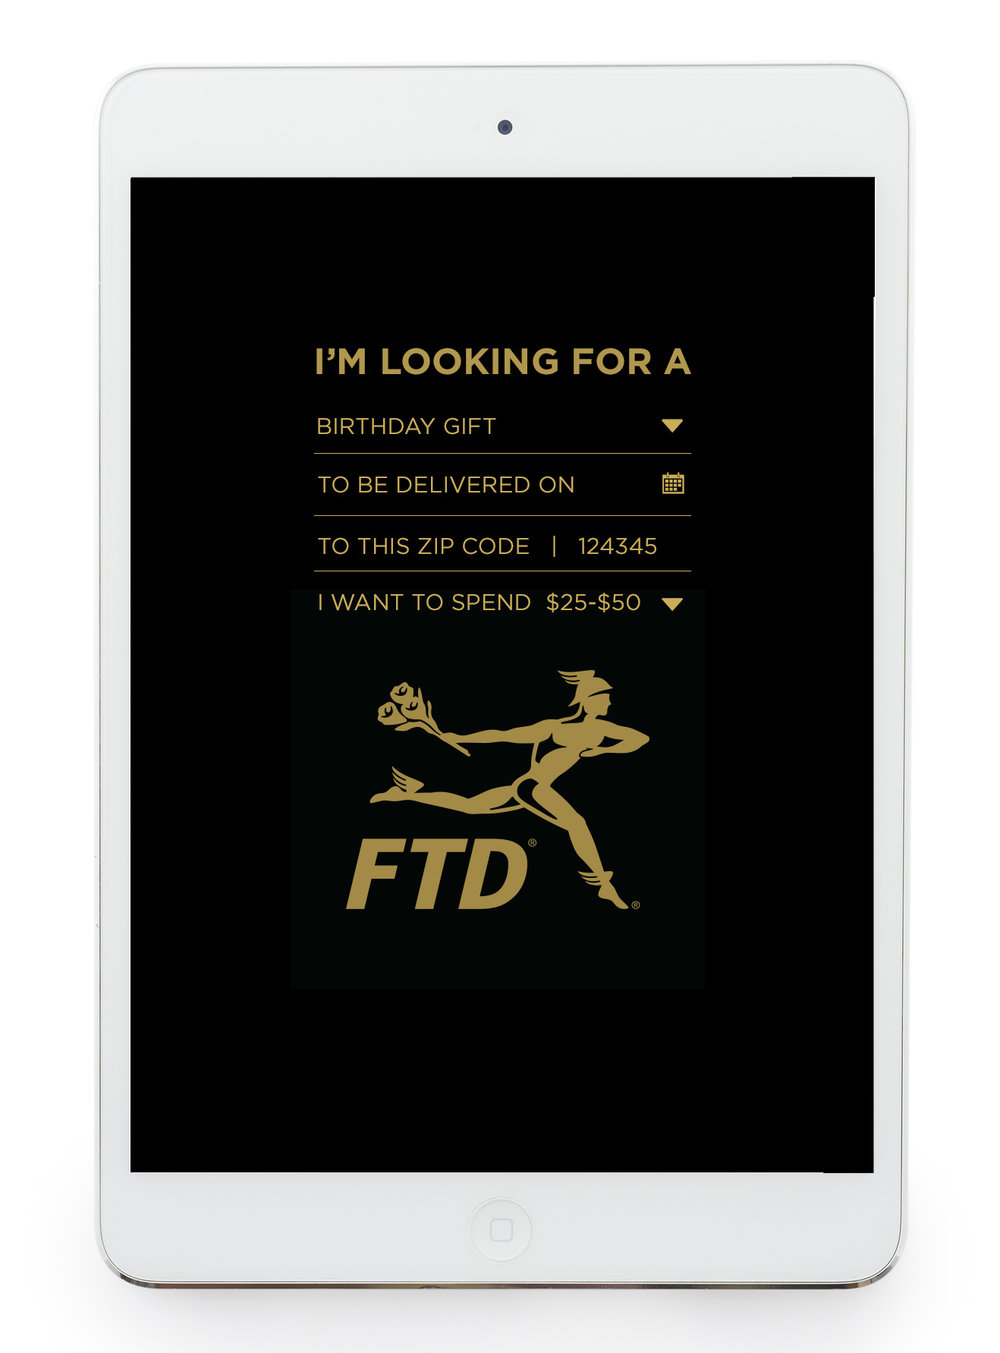 FTD_Flo_Dir_Inteface_04B.jpg